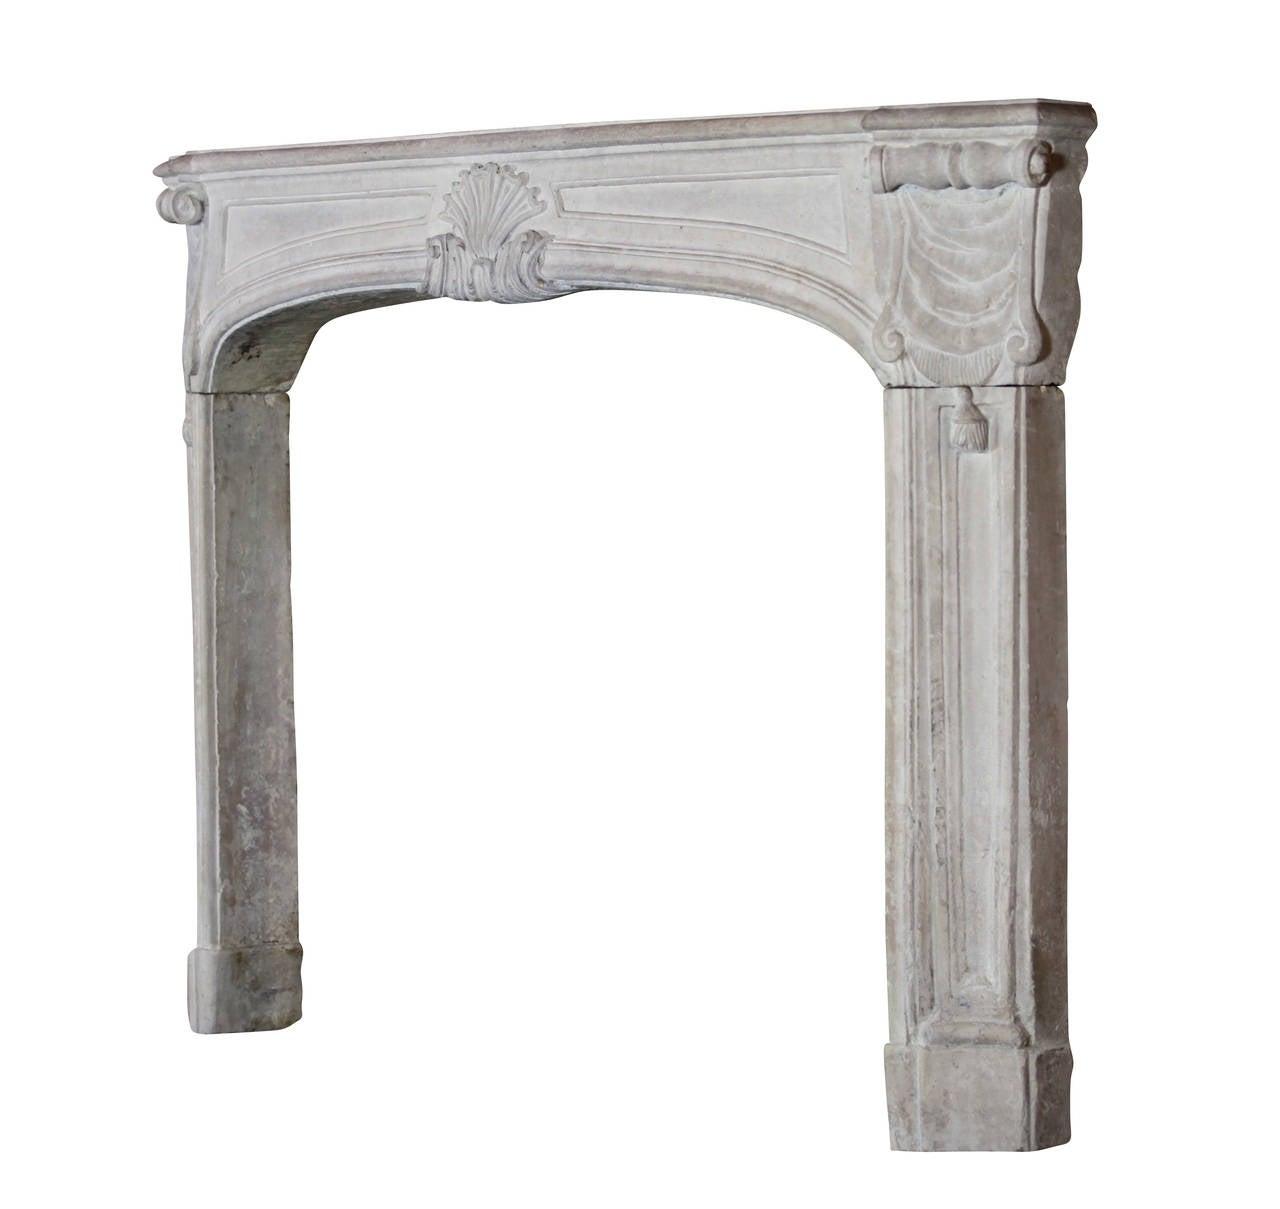 18th Century Regency Period Limestone Antique fireplace Mantel For Sale 3